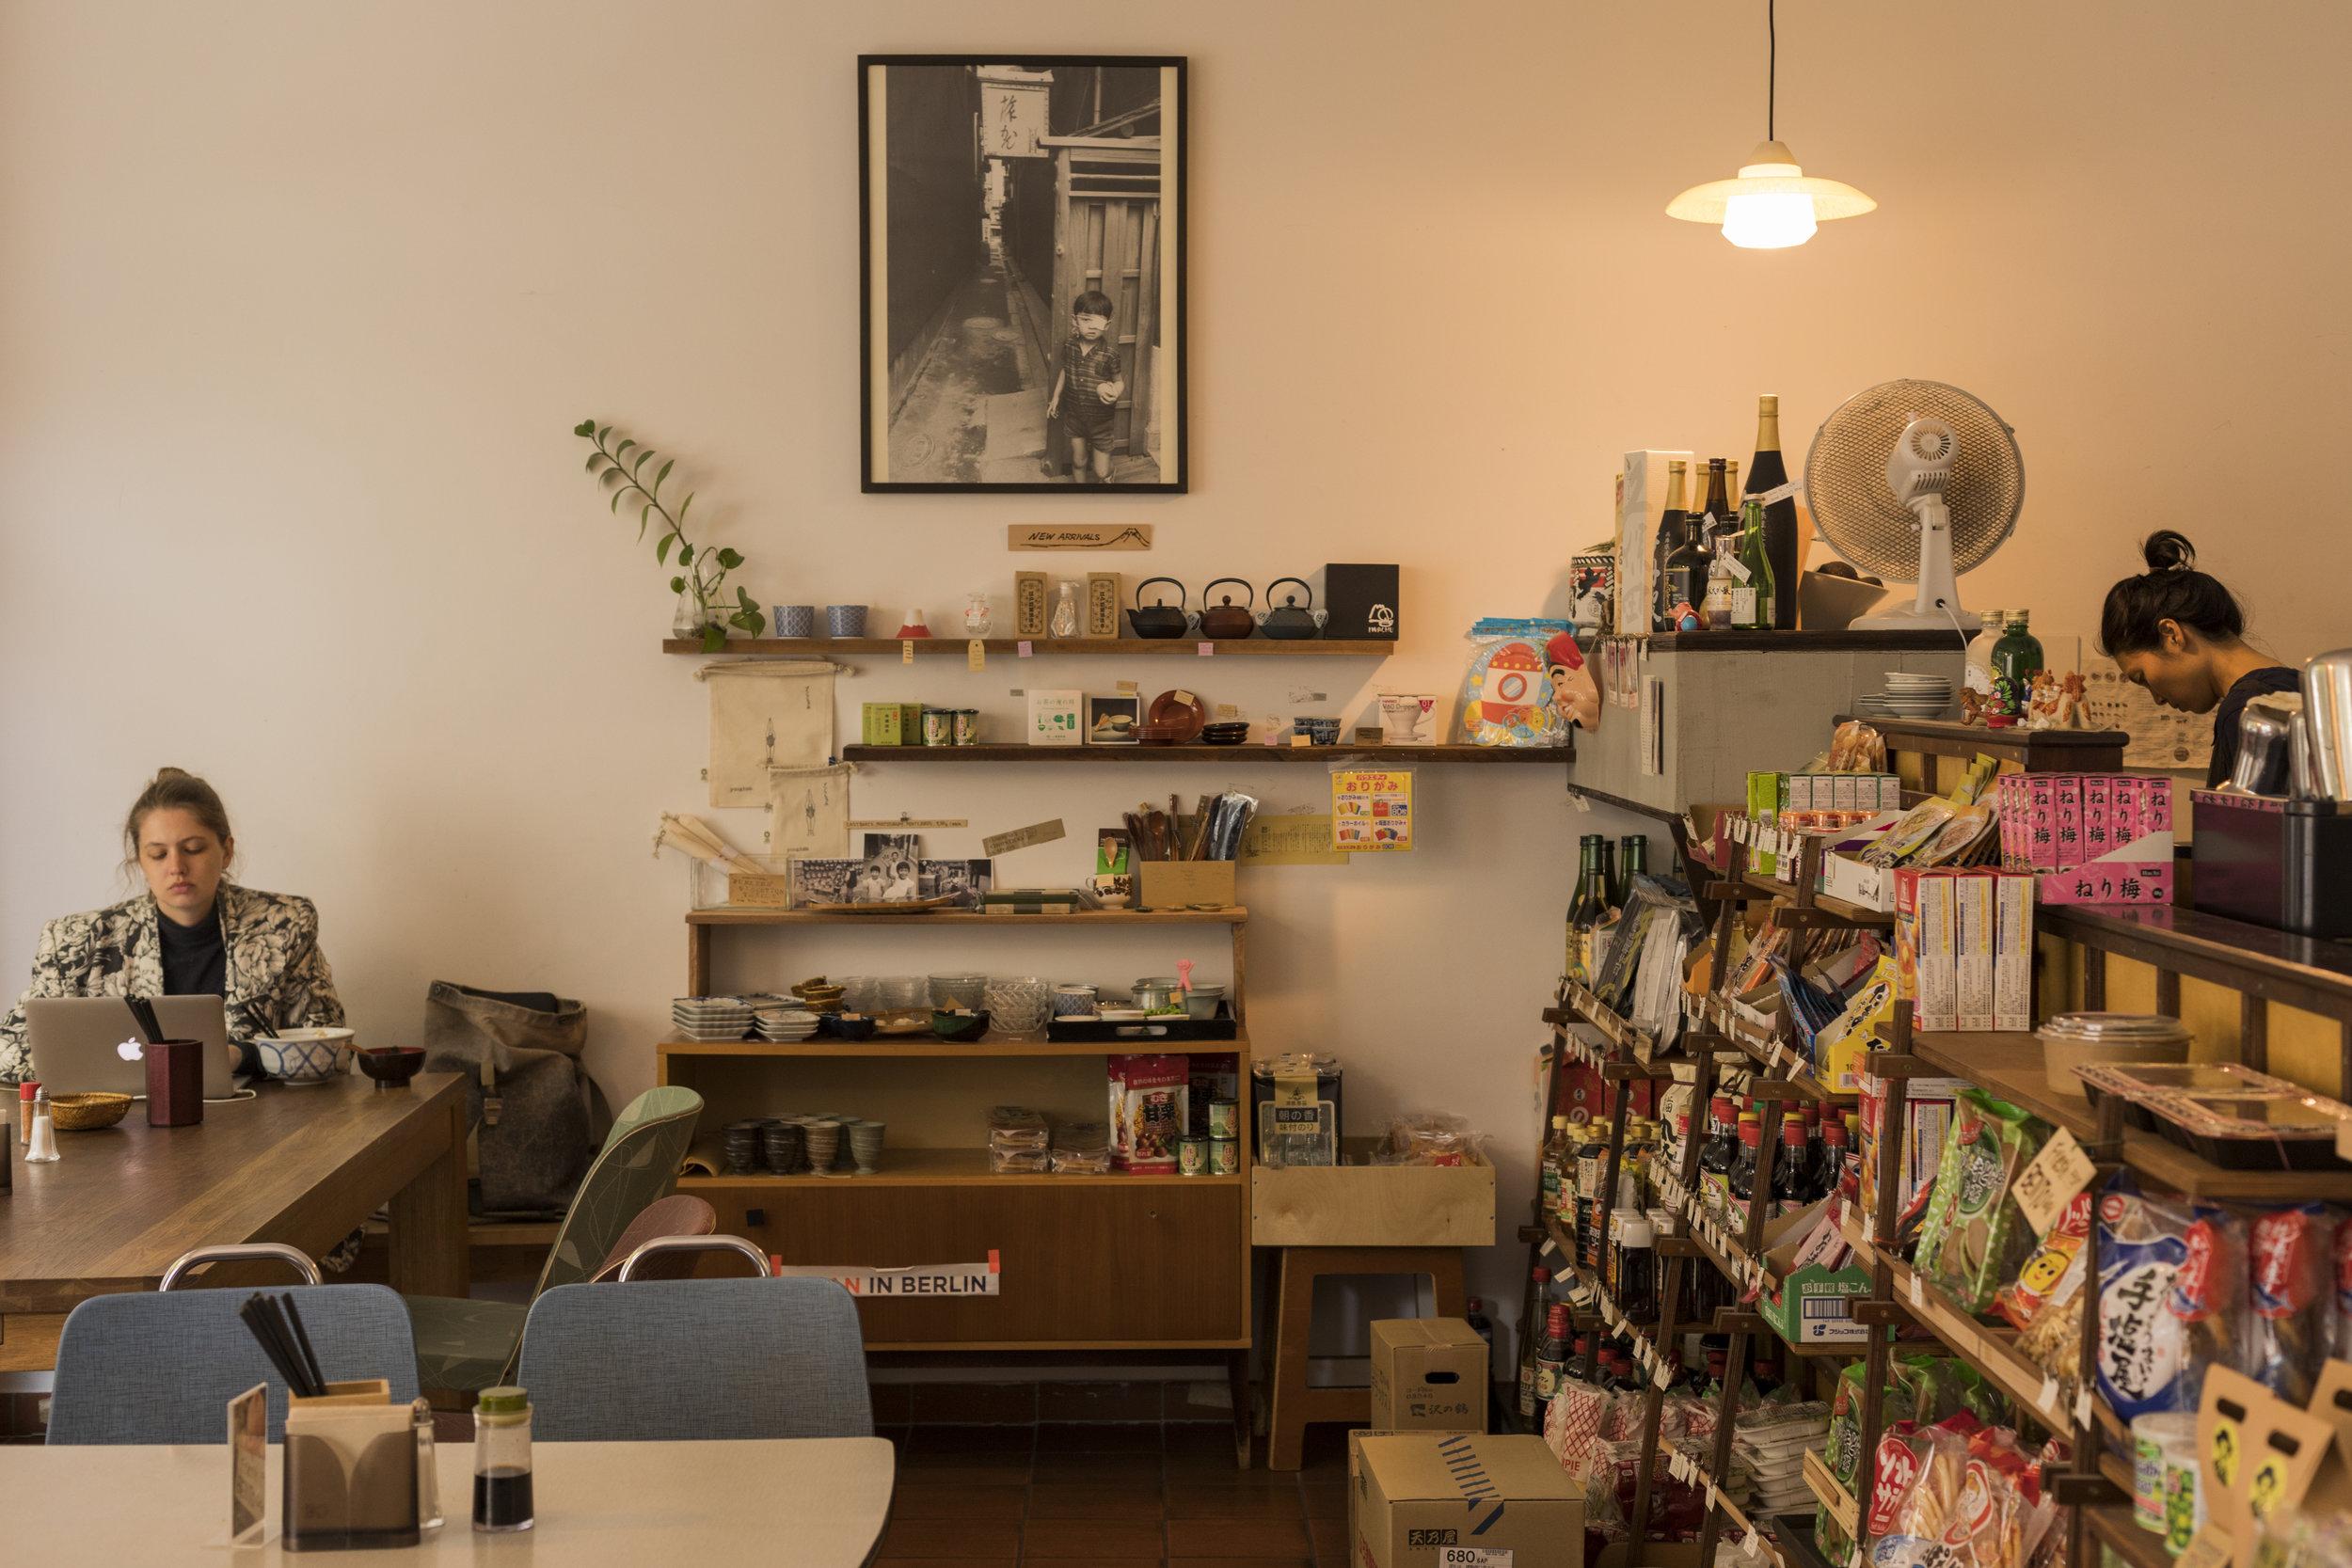 JAPANESE CAFÉ SMART DELI. CREDIT: HARIT SRIKHAO FOR LURE